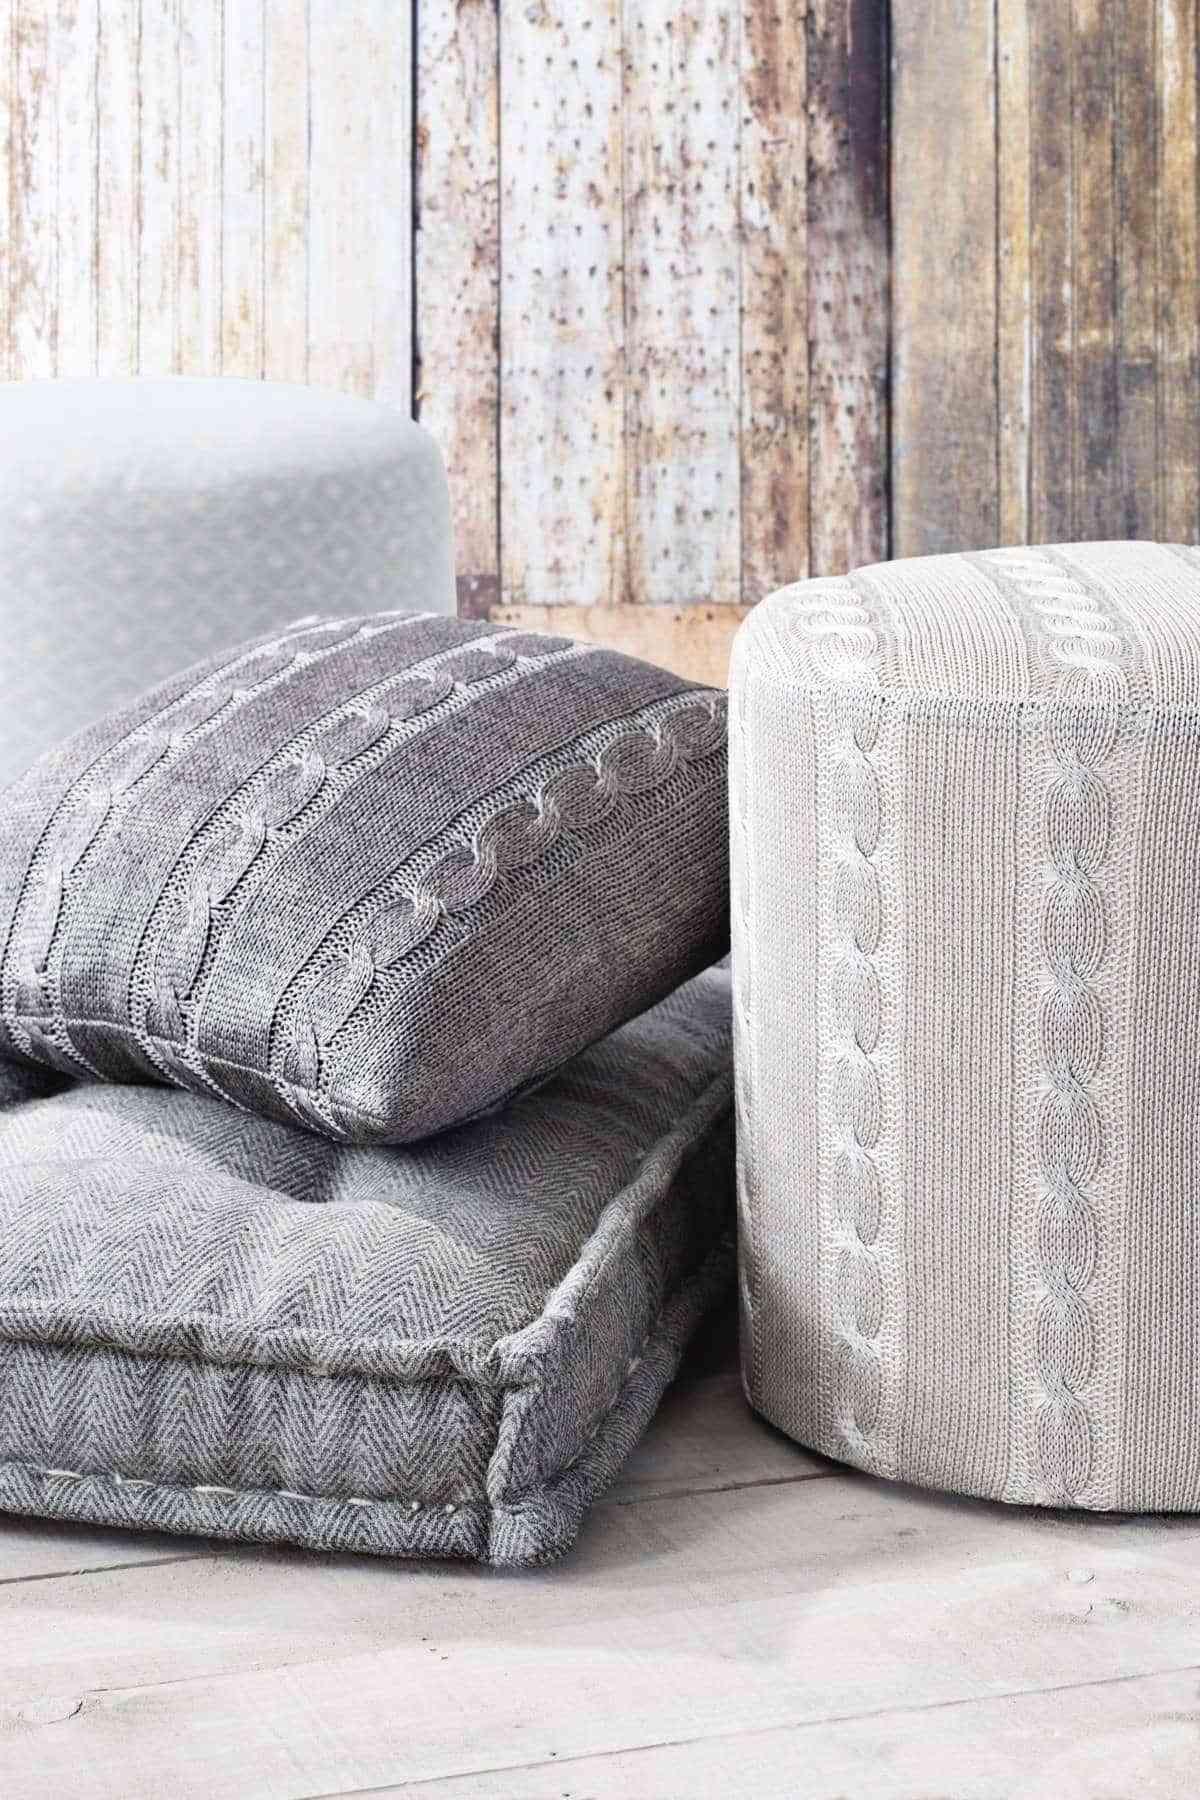 colecciones textiles - Tricot de Grancedo